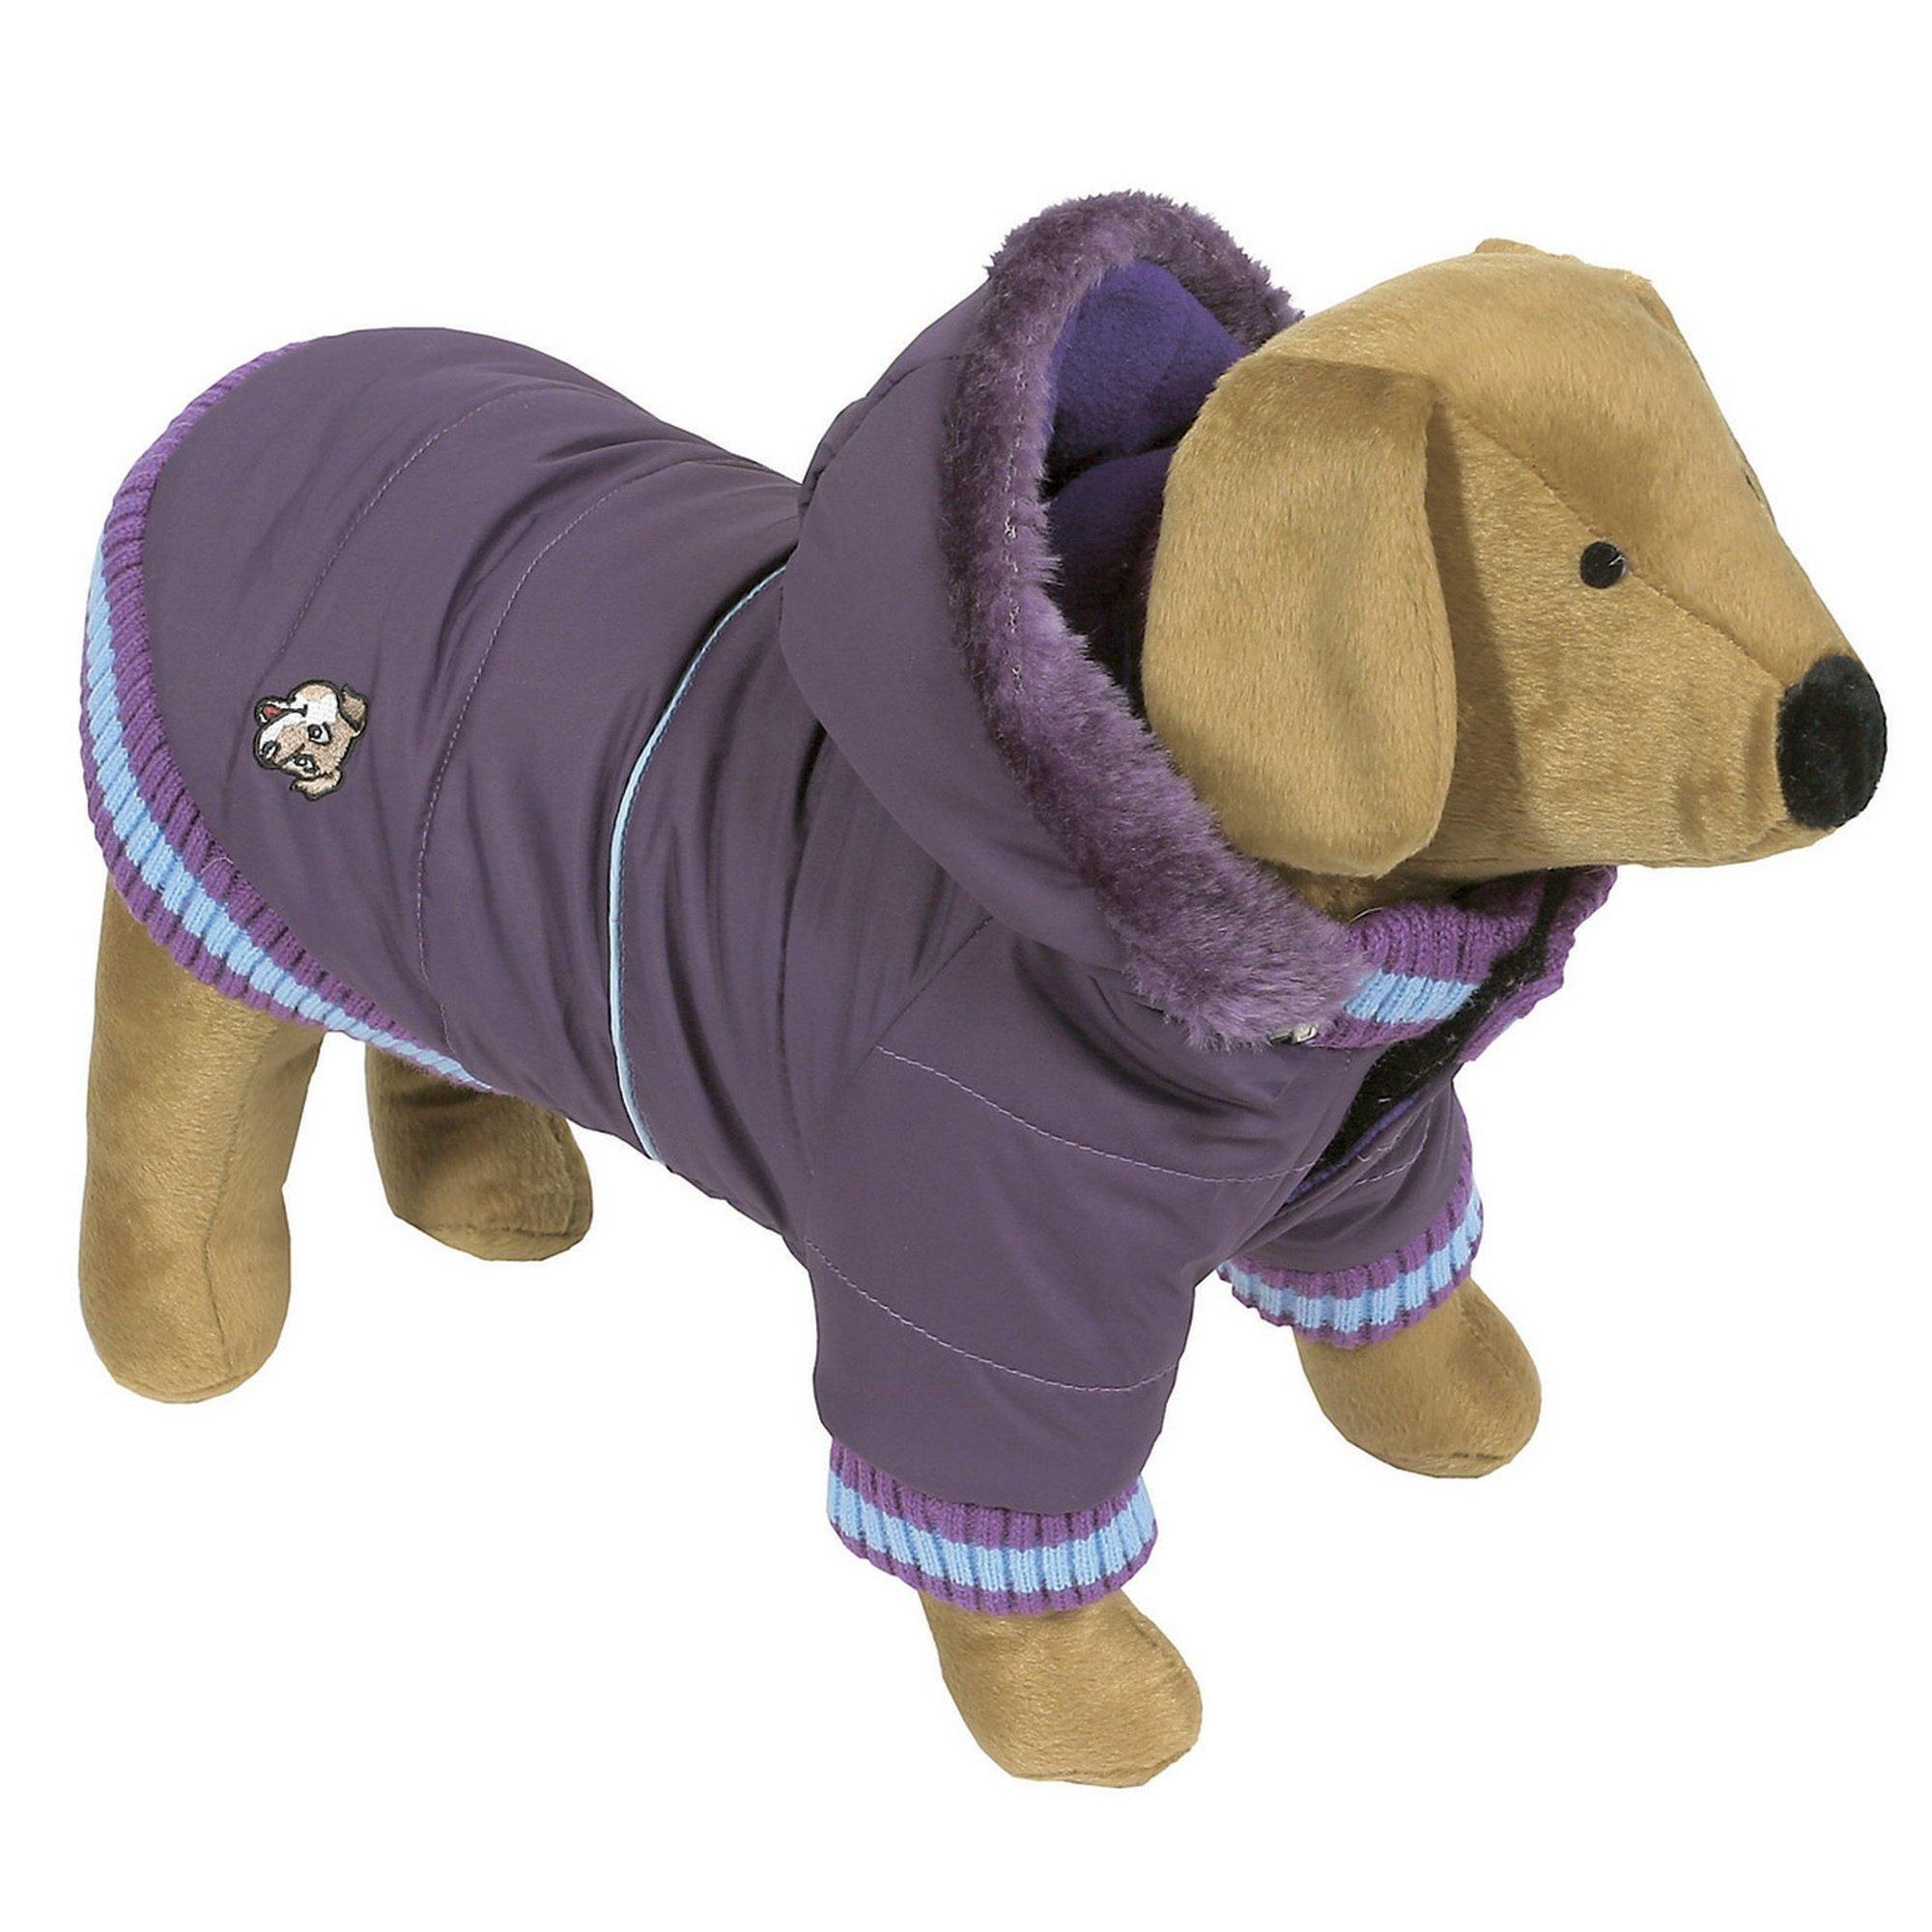 Animal Kingdom Doggy Things Dandy Parker Waterproof Dog Coat (X Small) (Purple)